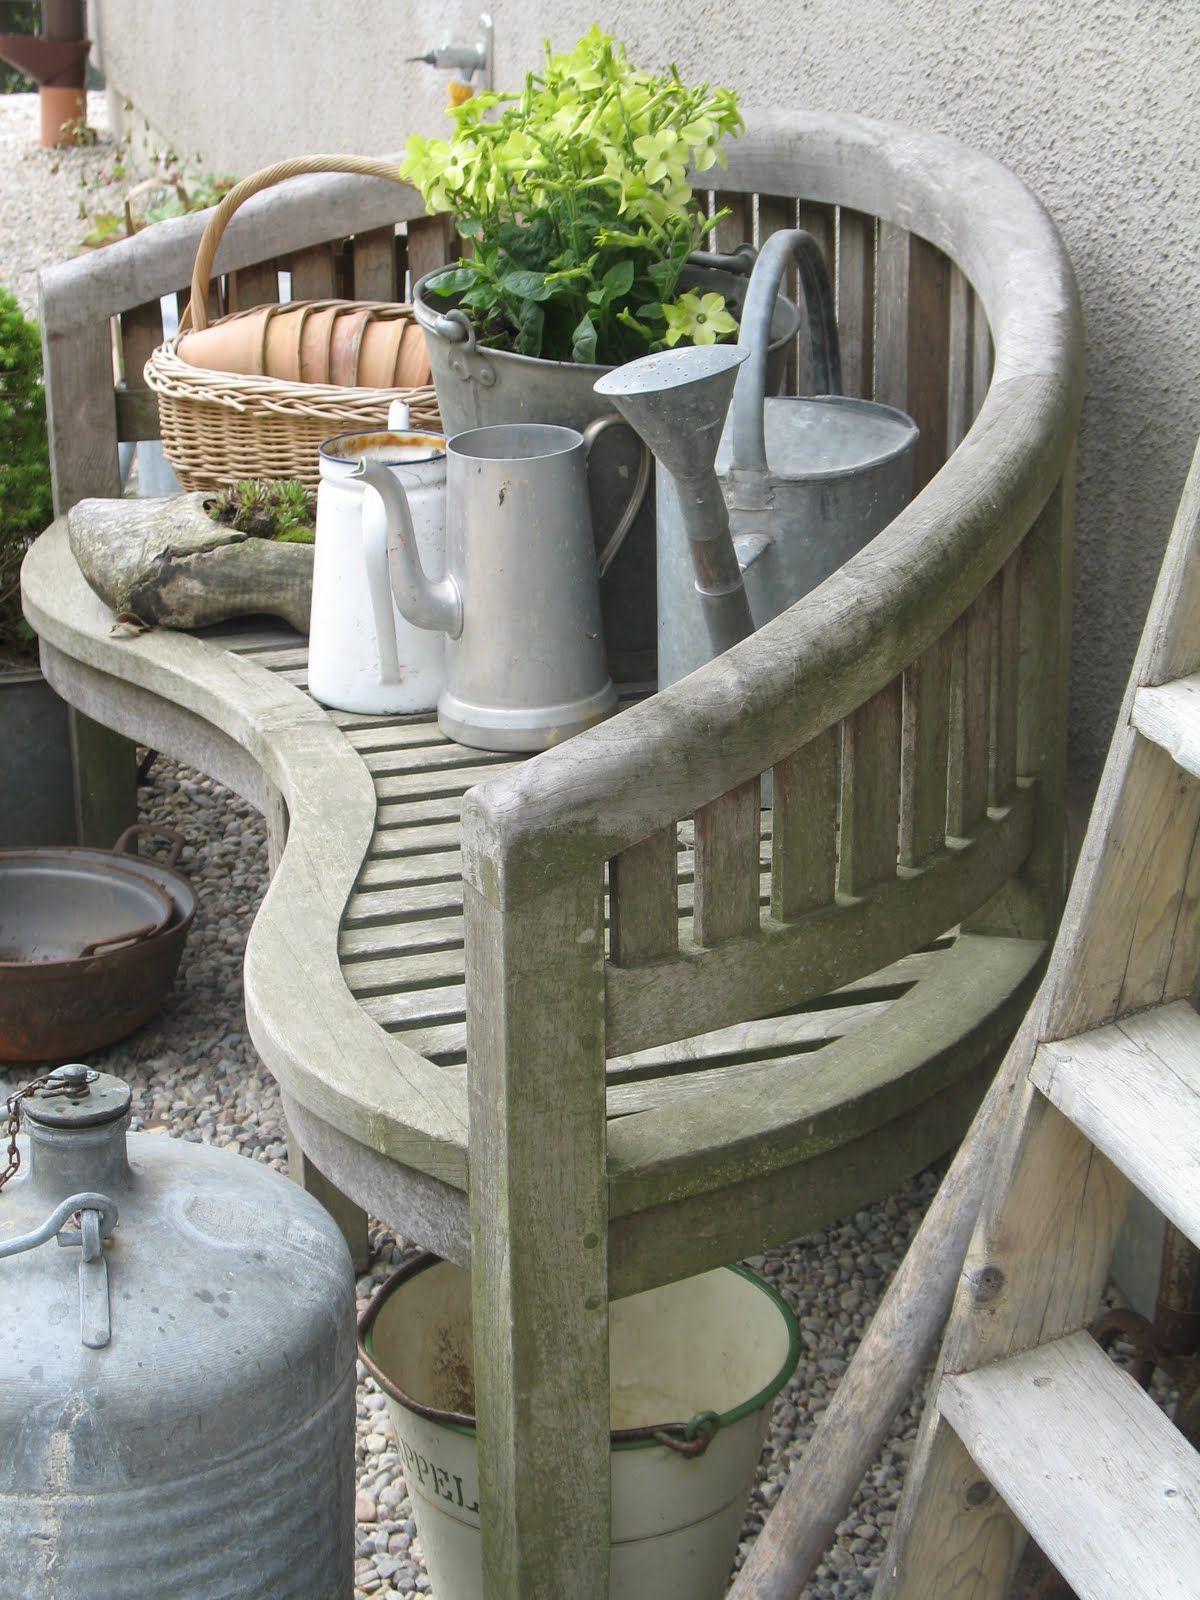 mazzwonen mazztuinmeubelen inspiratie outside garden decorations tuindecoratie tuin on zink outdoor kitchen id=37014